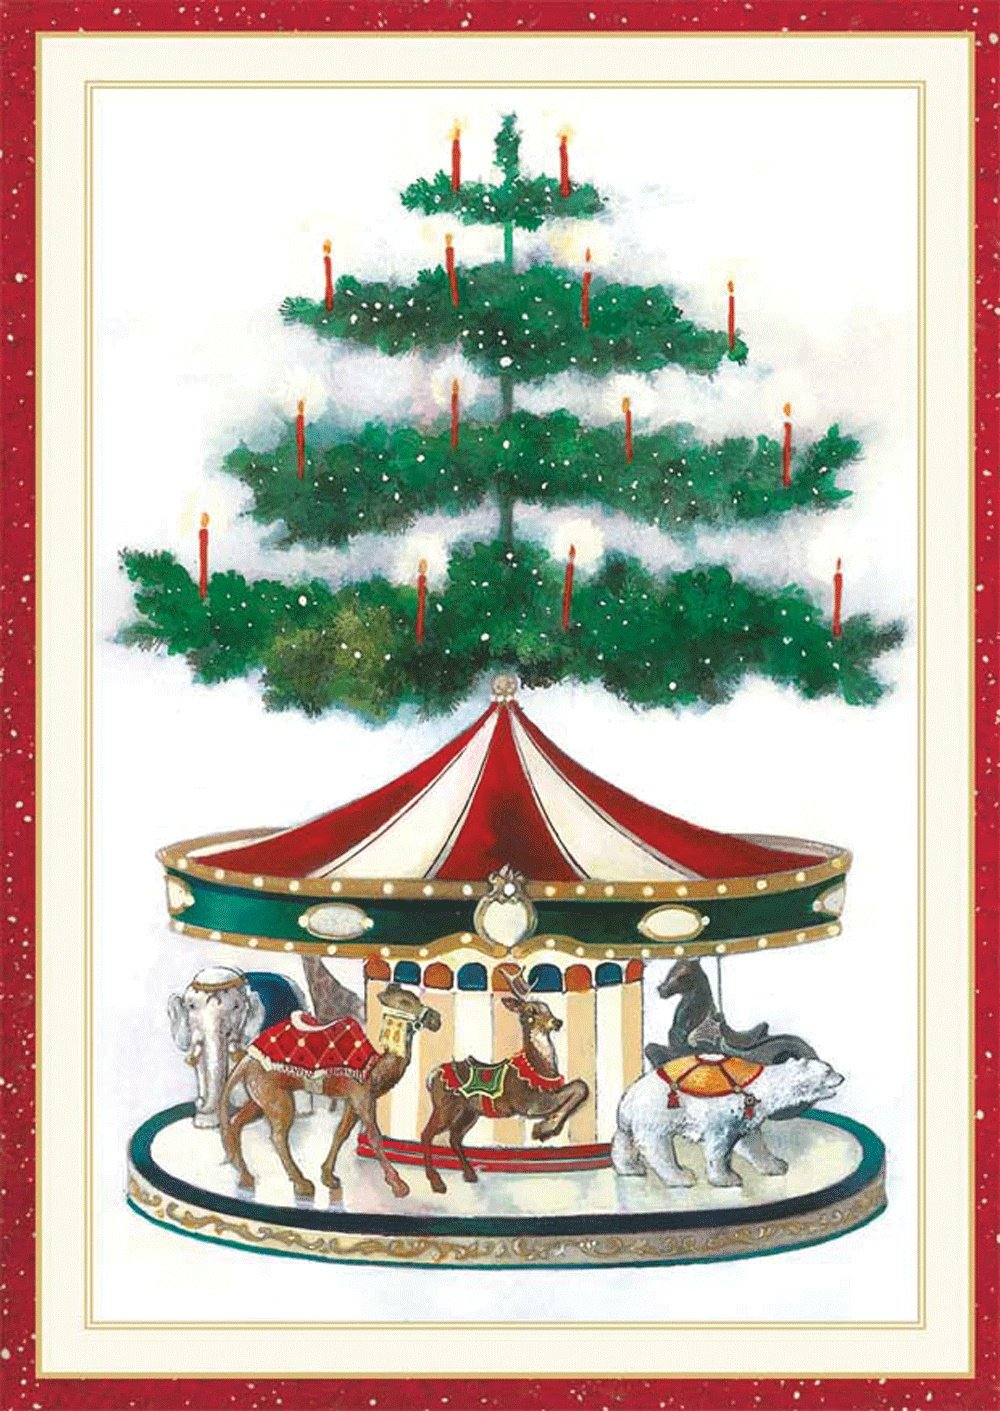 Caspari Christmas Cards.Entertaining With Caspari Christmas Carousel Christmas Cards Box Of 16 Red 4 X 5 3 4